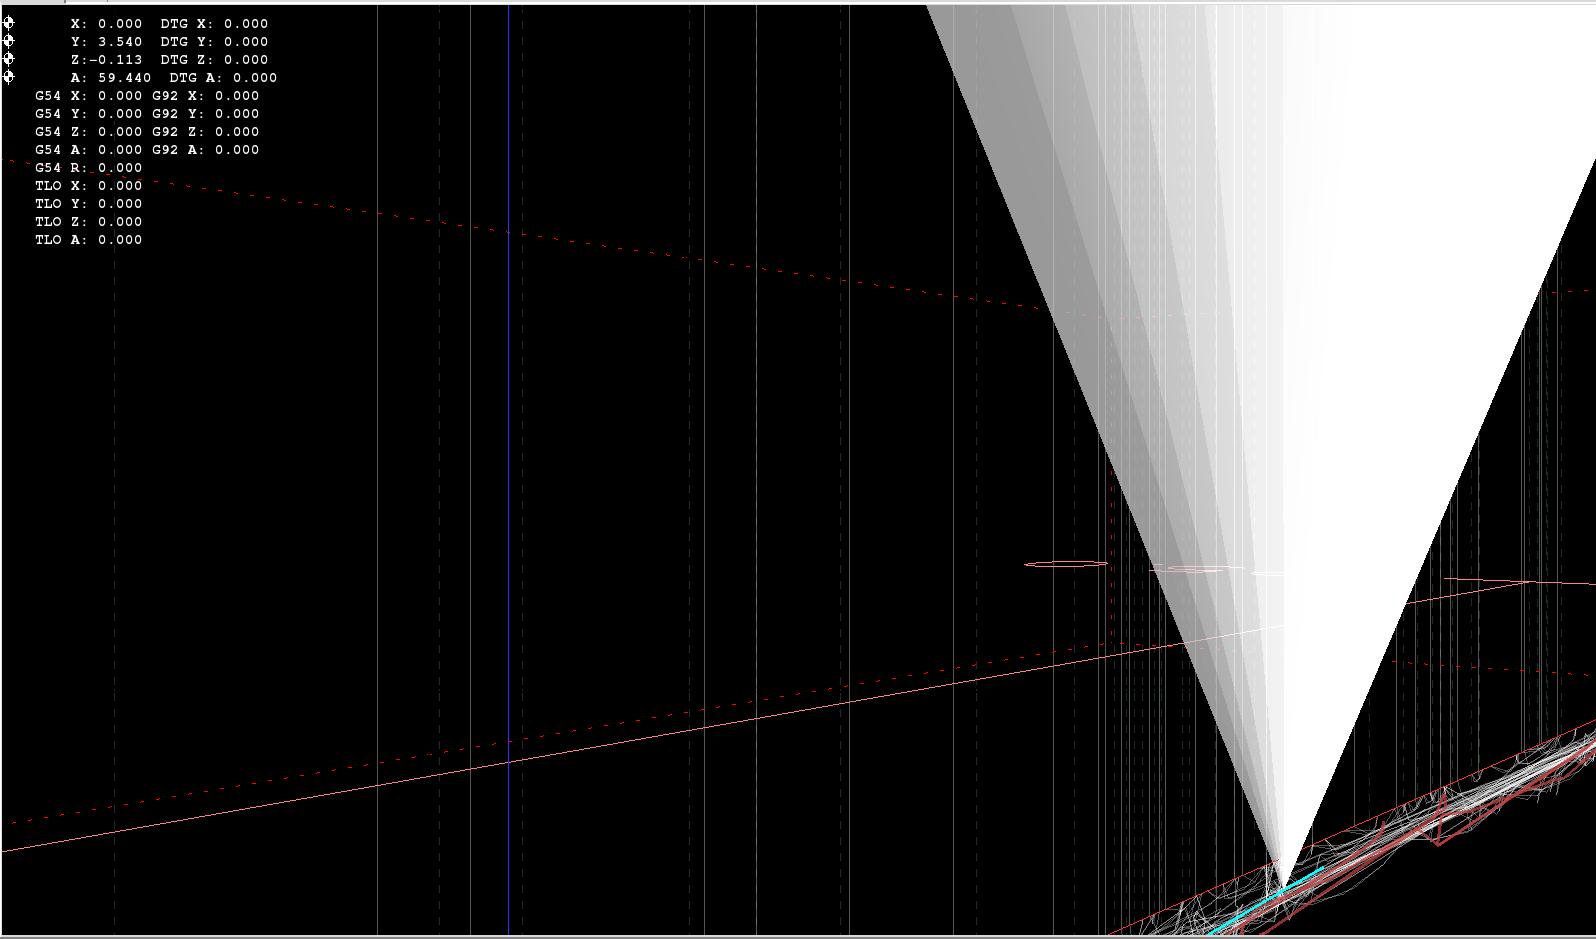 Screenshot-071016-18:59:22.png